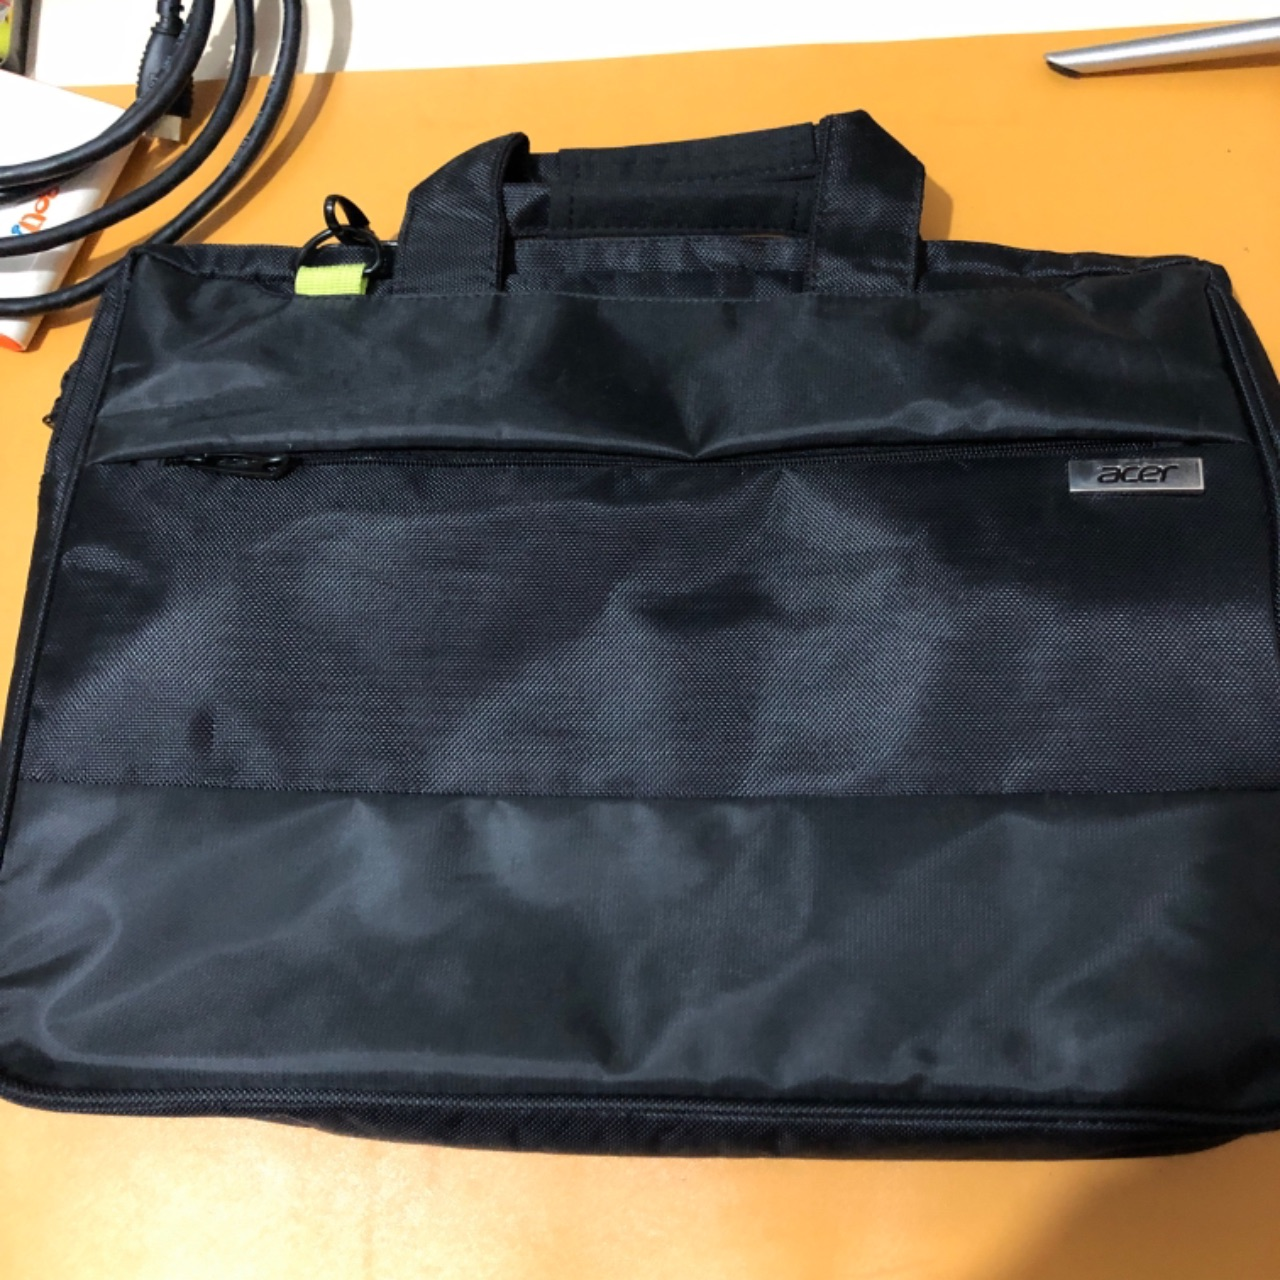 Tas Laptop Acer NEW0